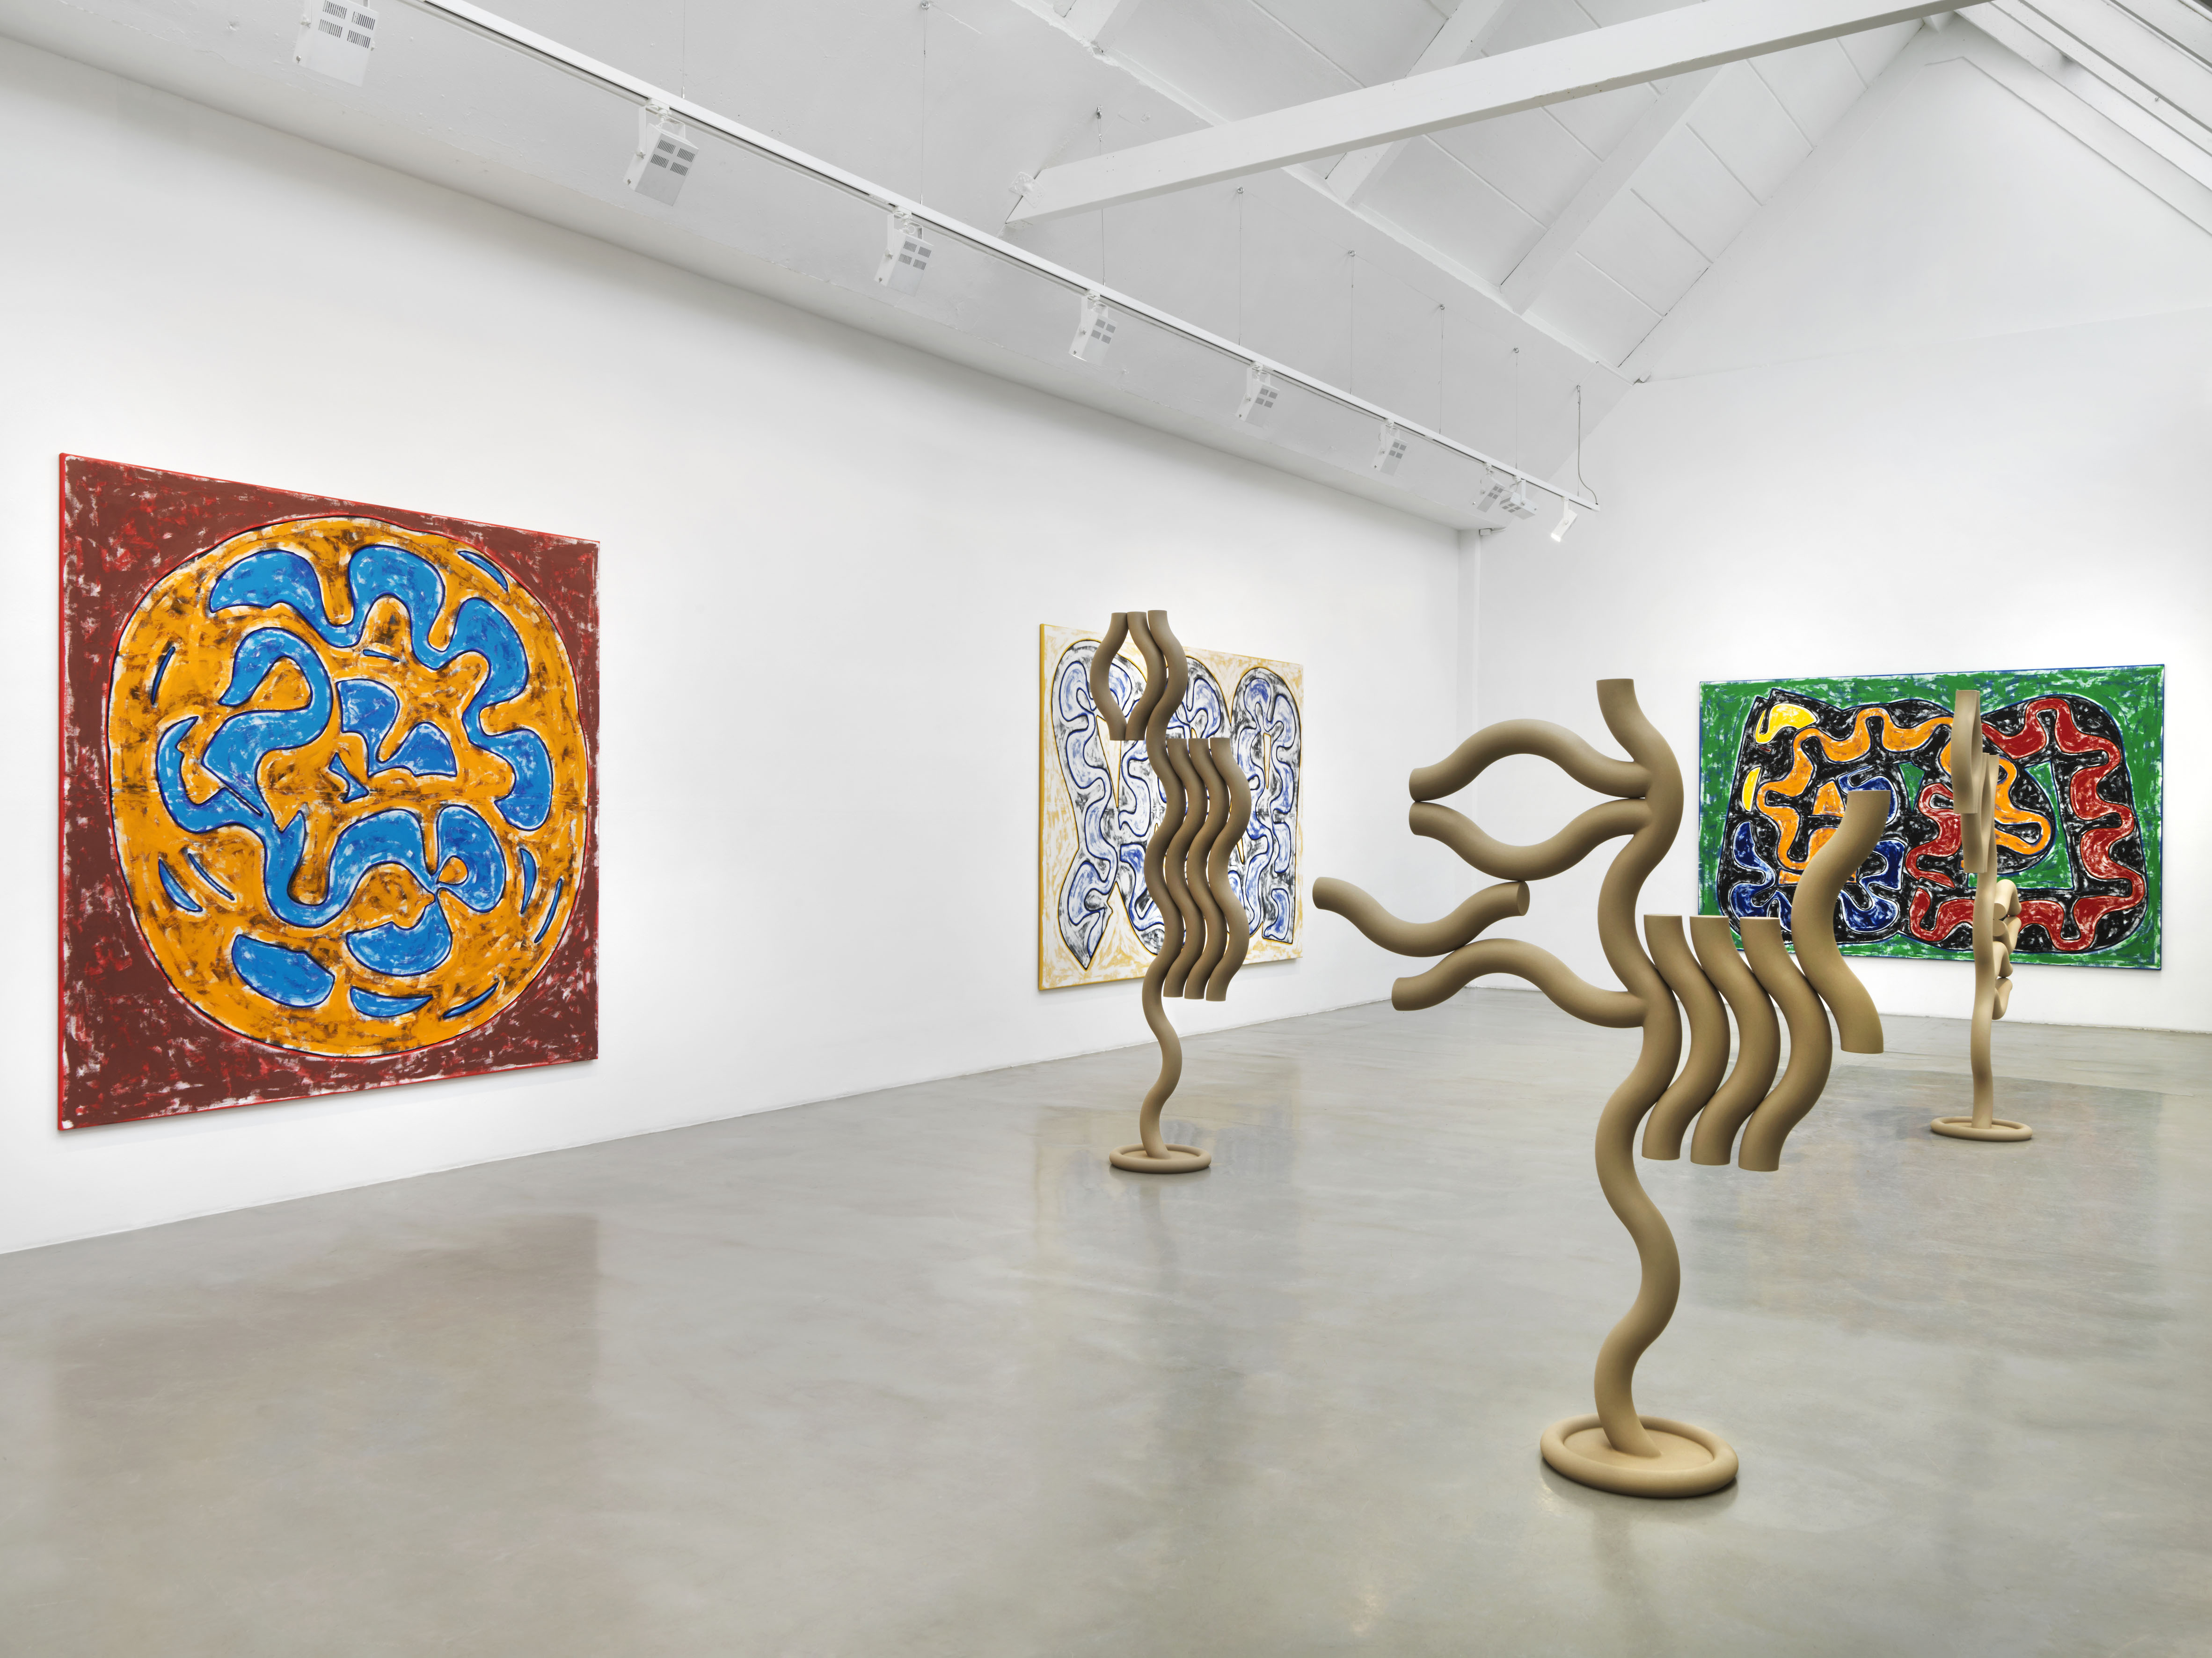 Galerie Barbara Thumm